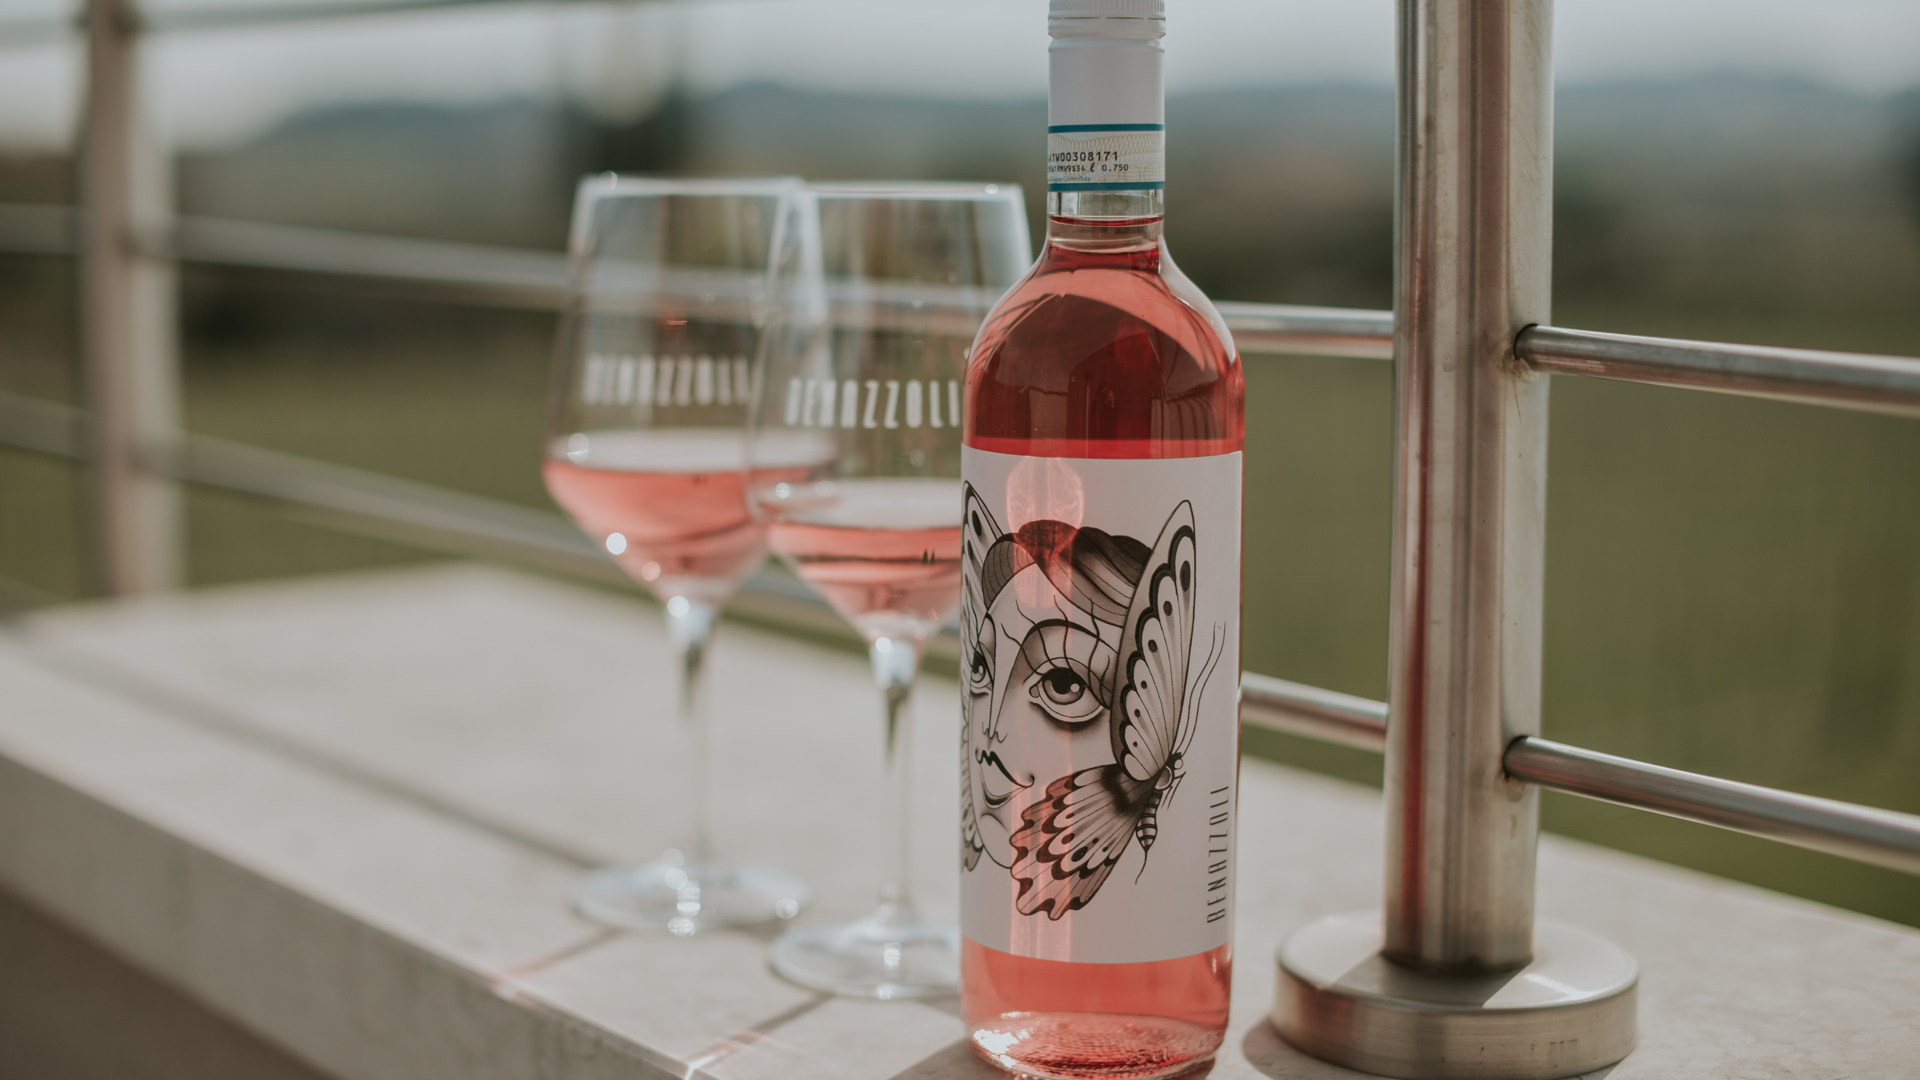 Lake Garda and its rosé